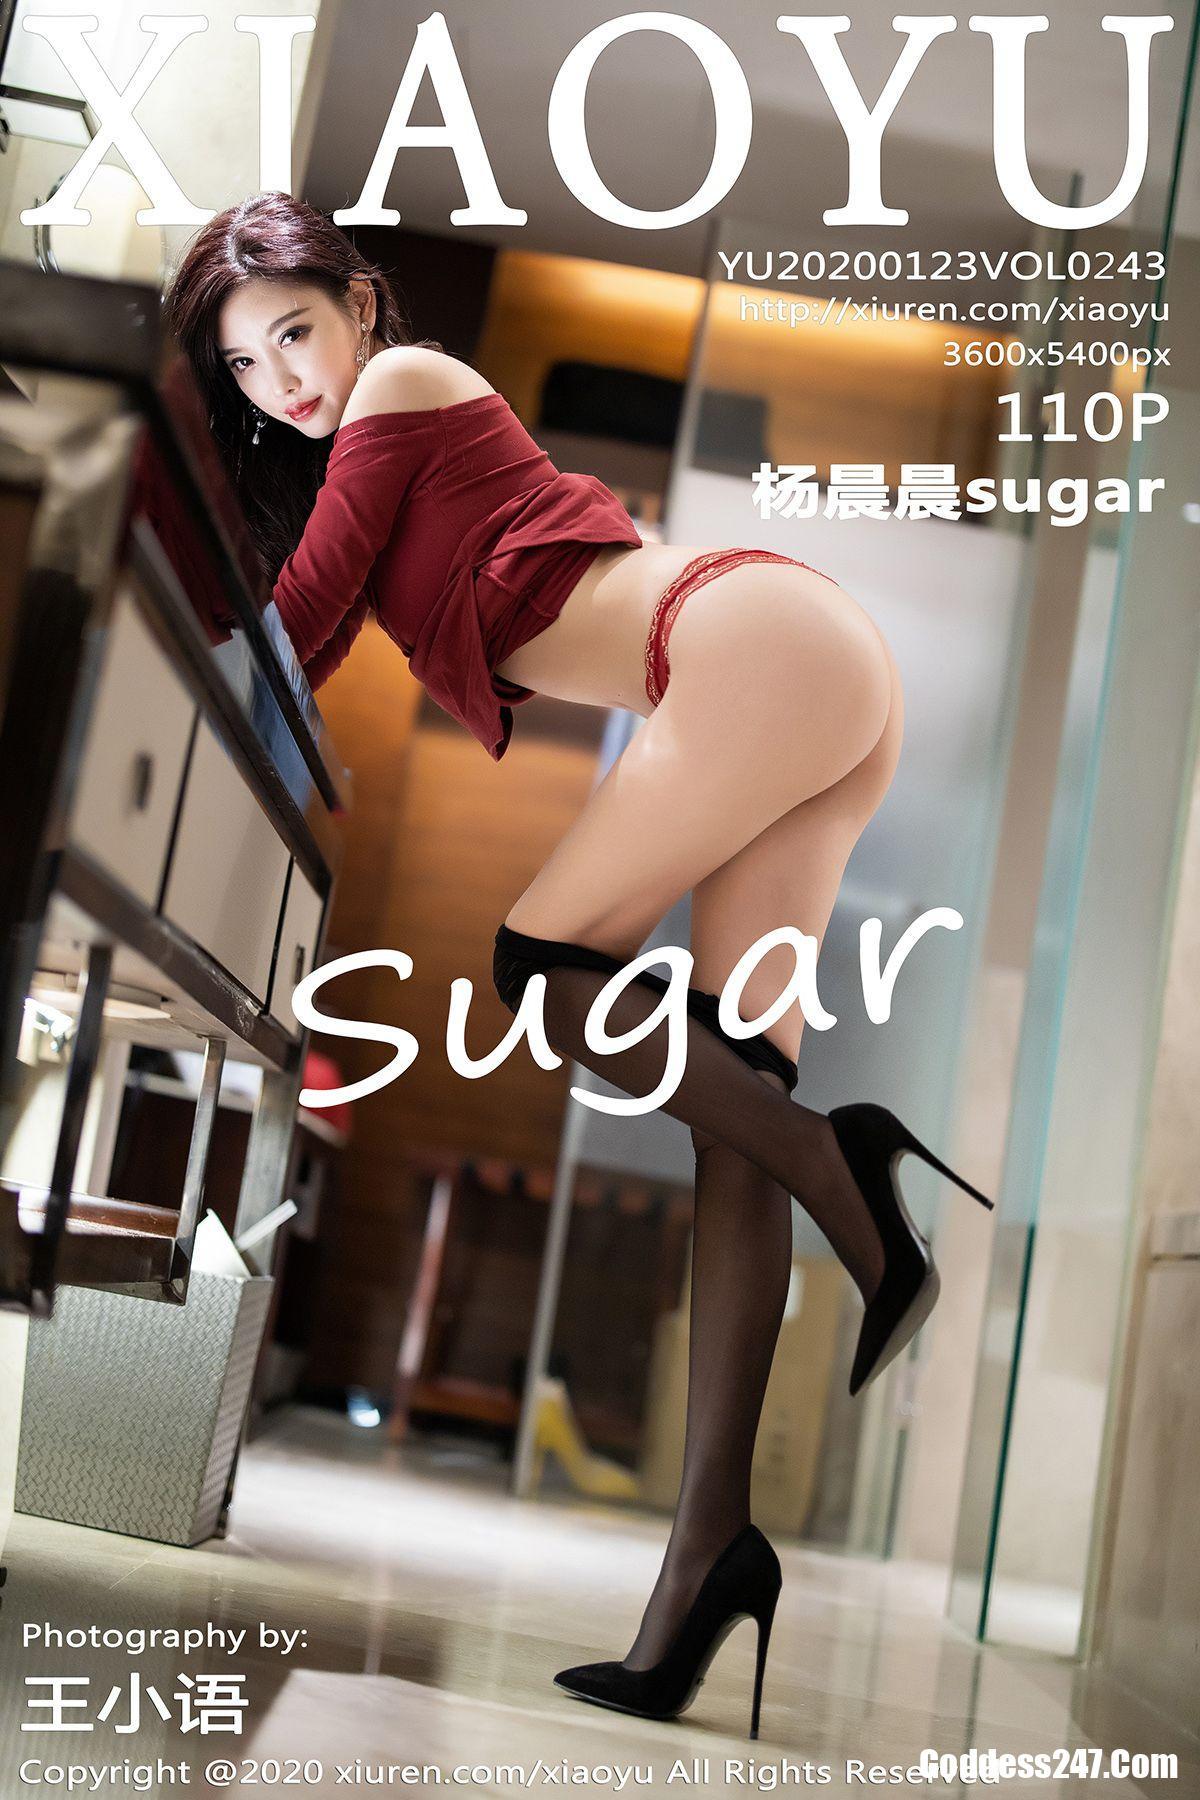 XiaoYu Vol.243 杨晨晨sugar